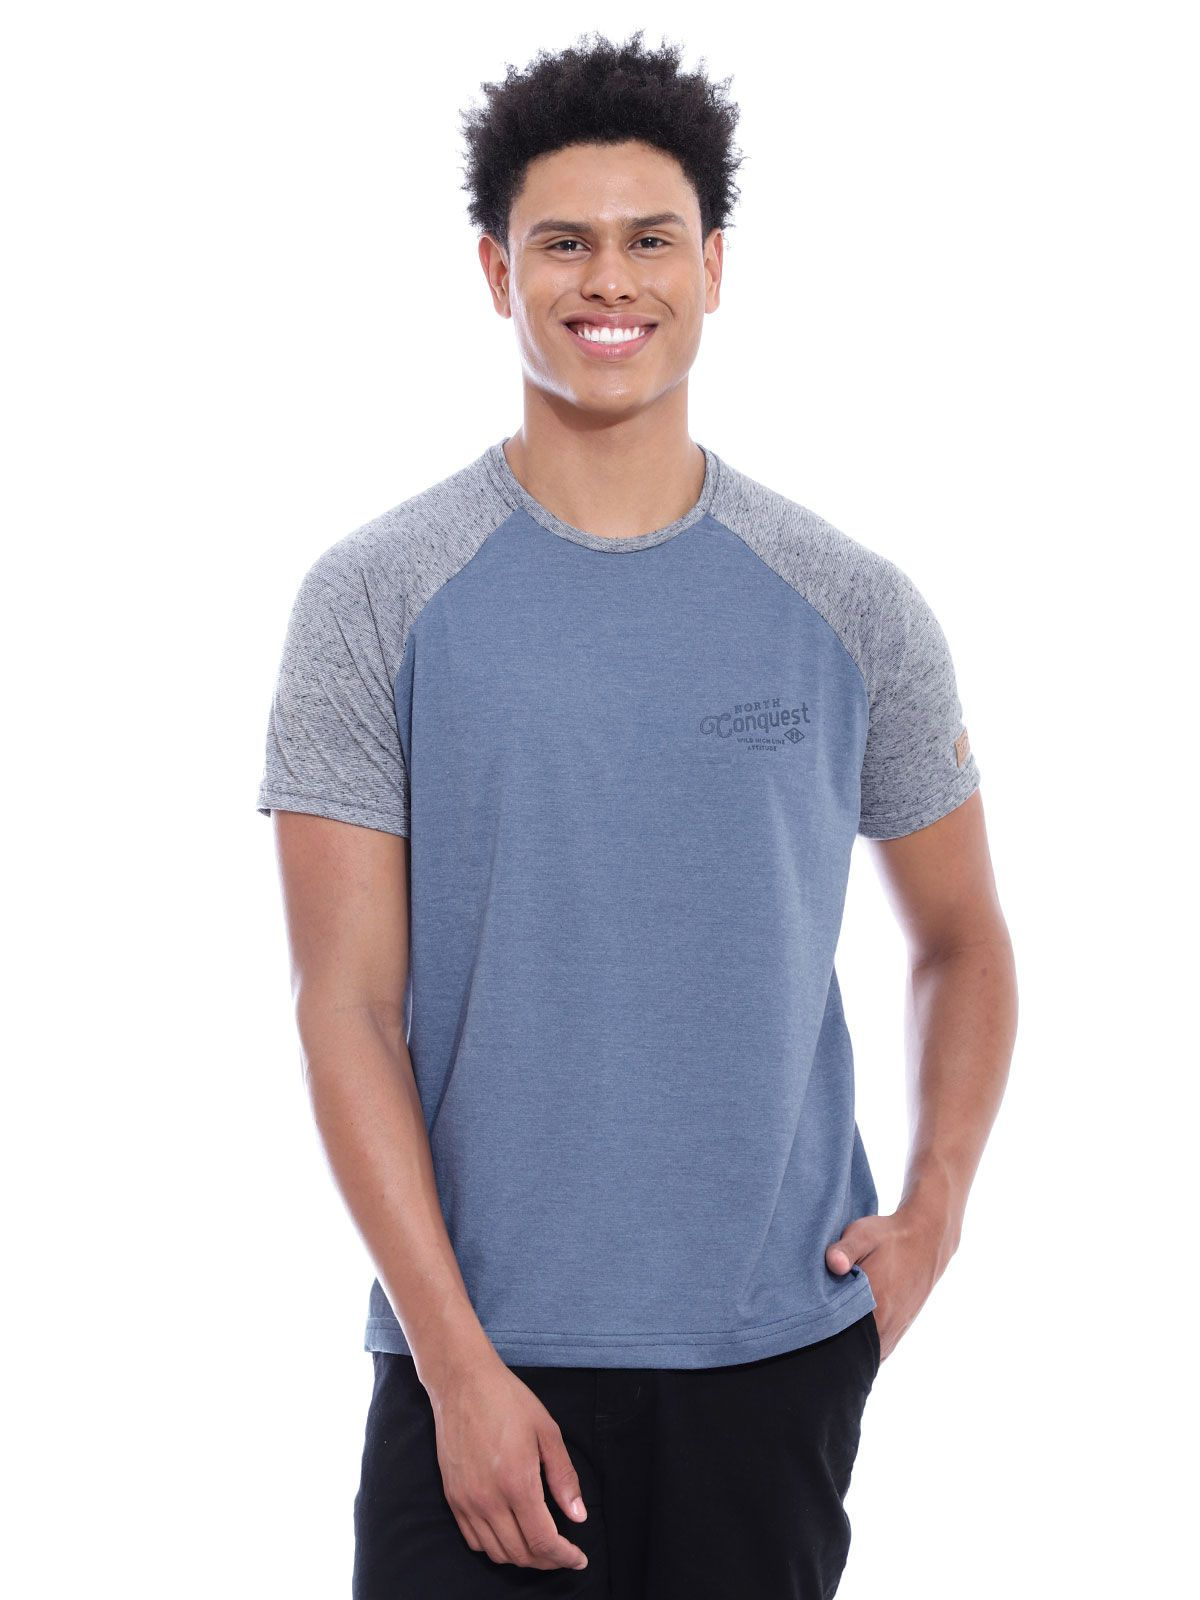 Camiseta Masculina Raglã Botonê Anistia Jeans